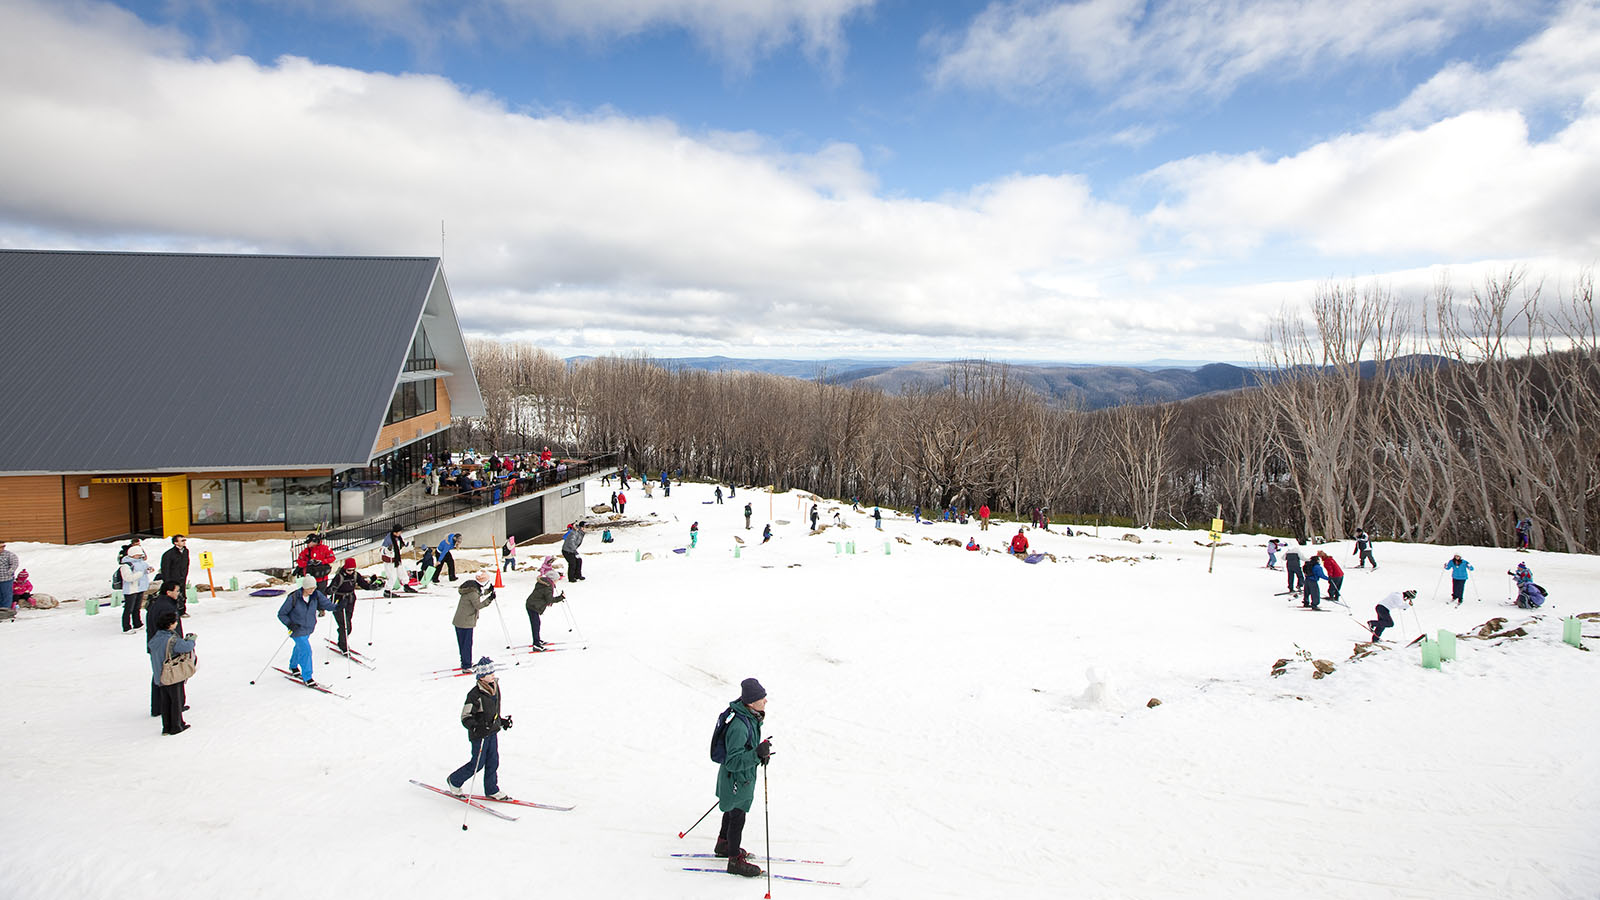 Lake Mountain Alpine Resort, Yarra Valley & Dandenong Ranges, Victoria, Australia